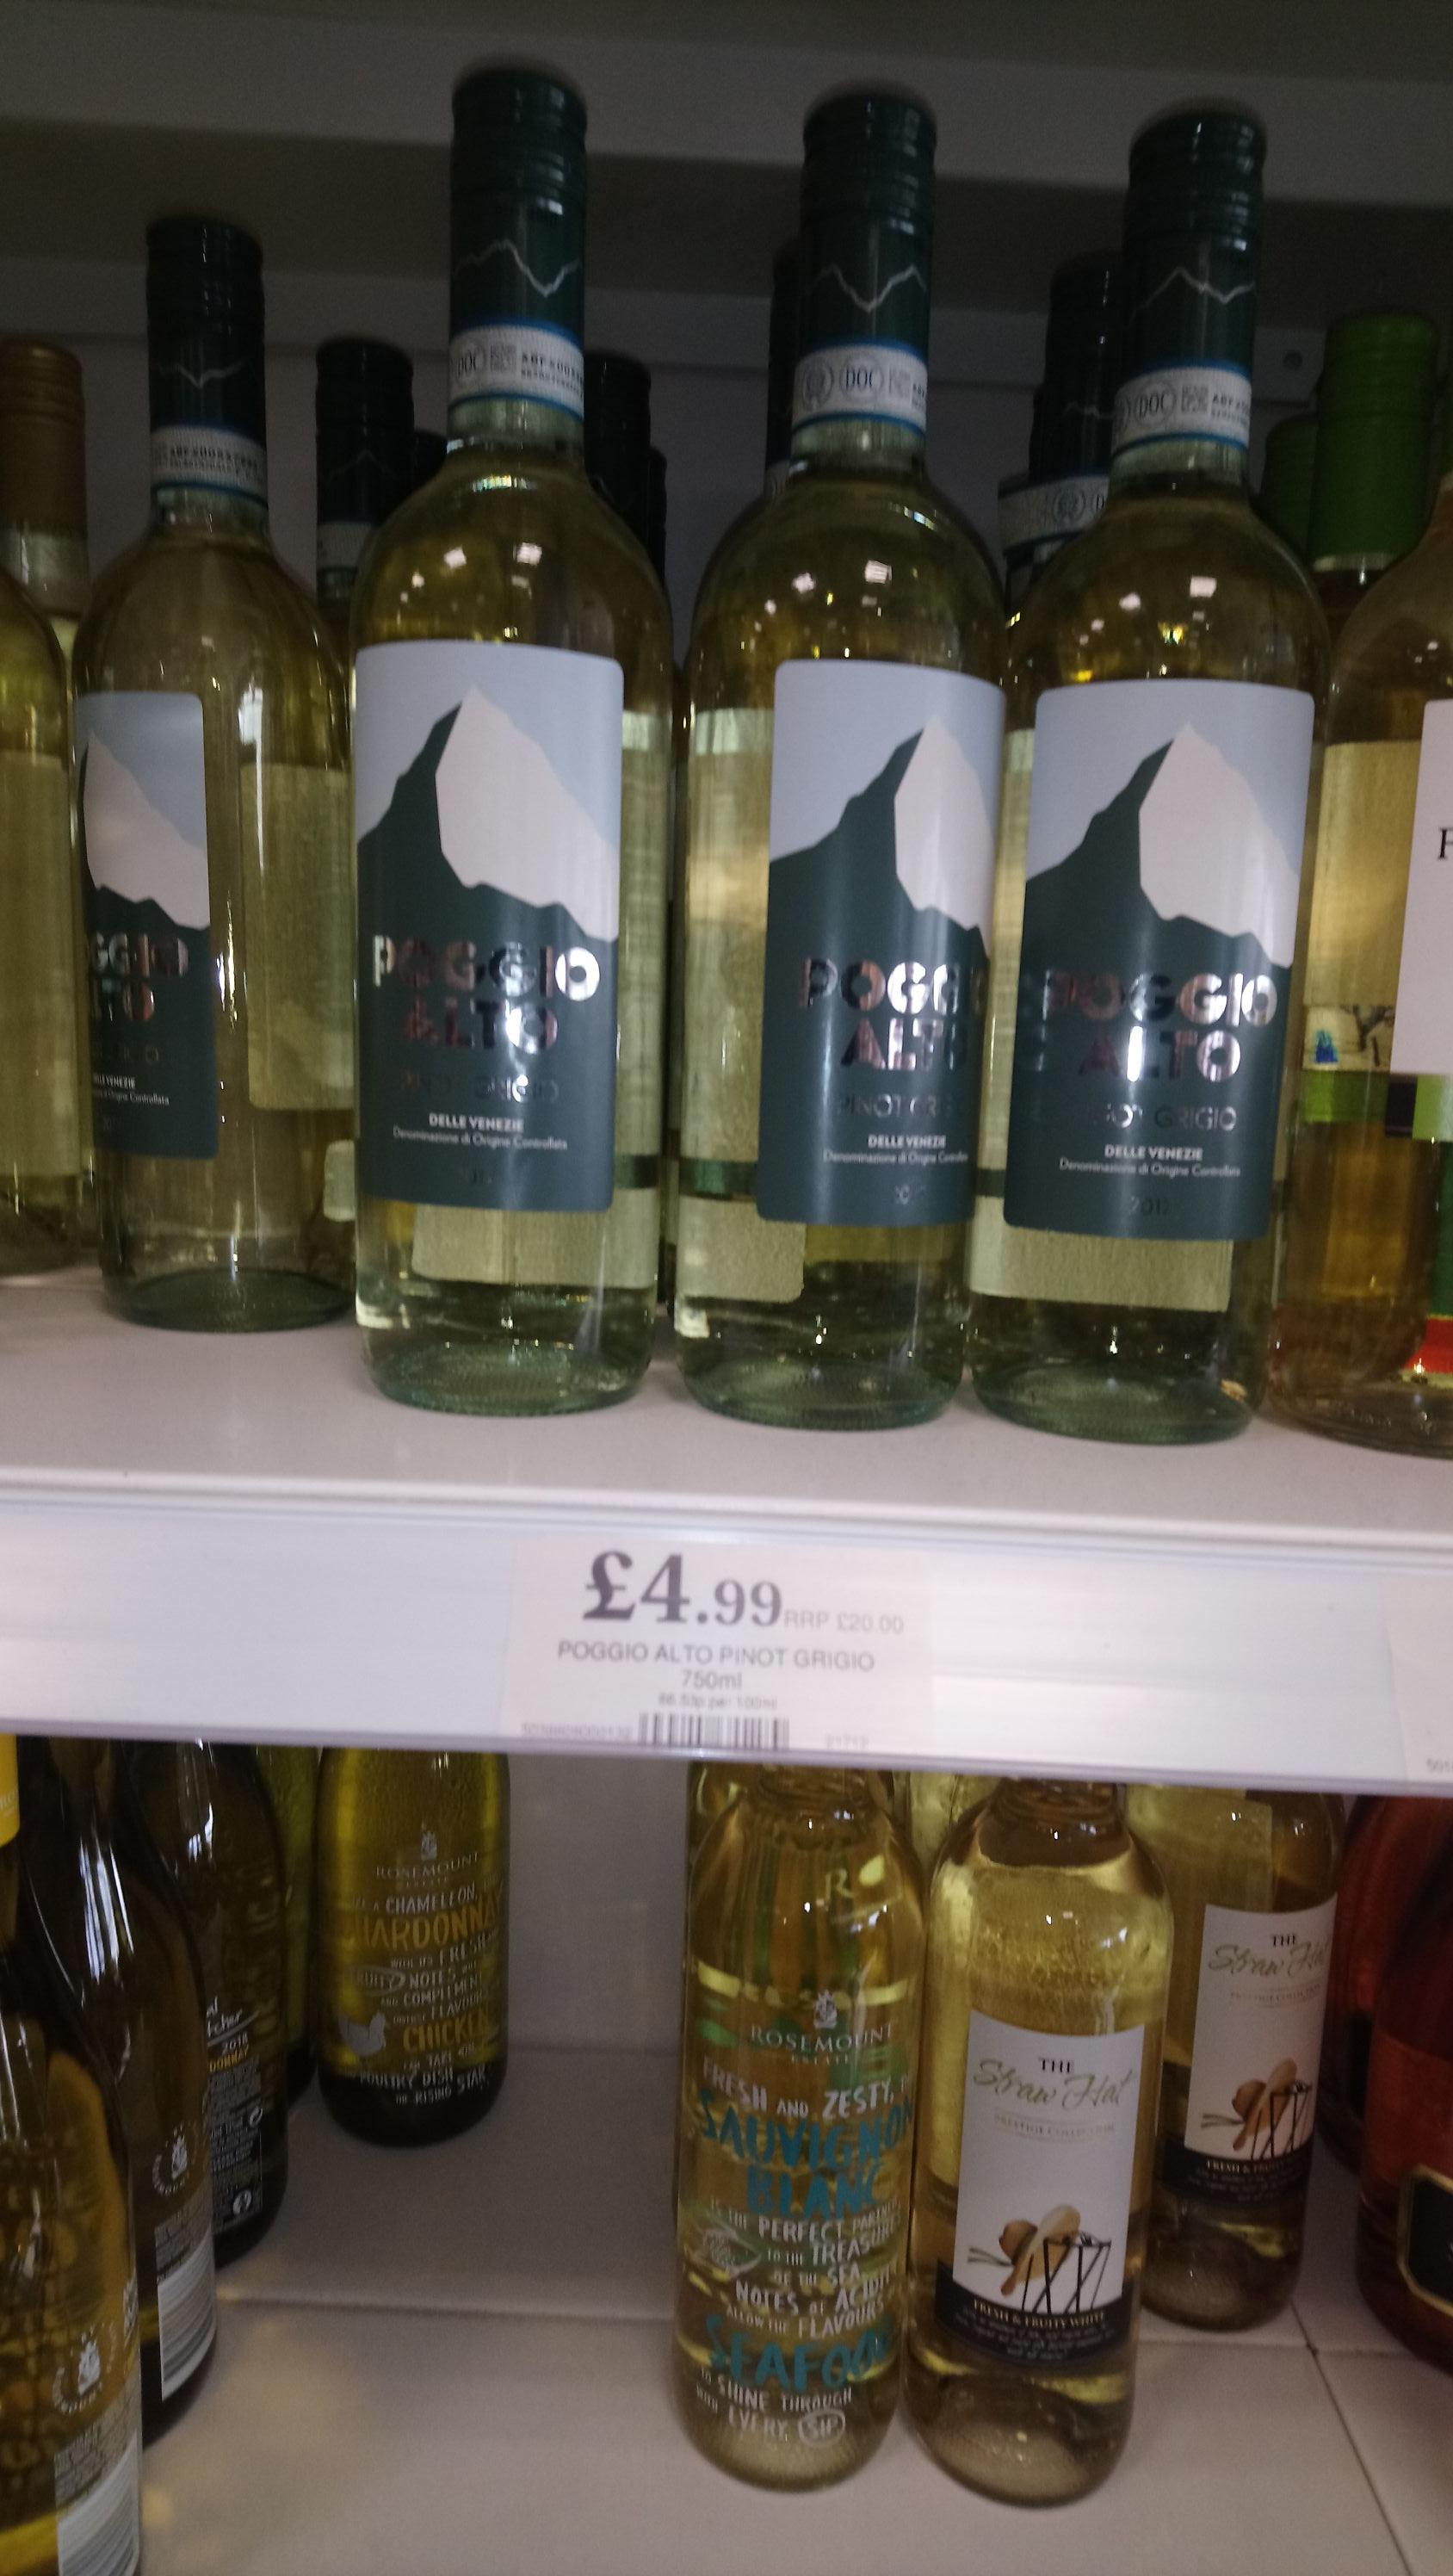 Pinot Alto pinot grigio £4.99 @ Home bargains Thurrick Essex